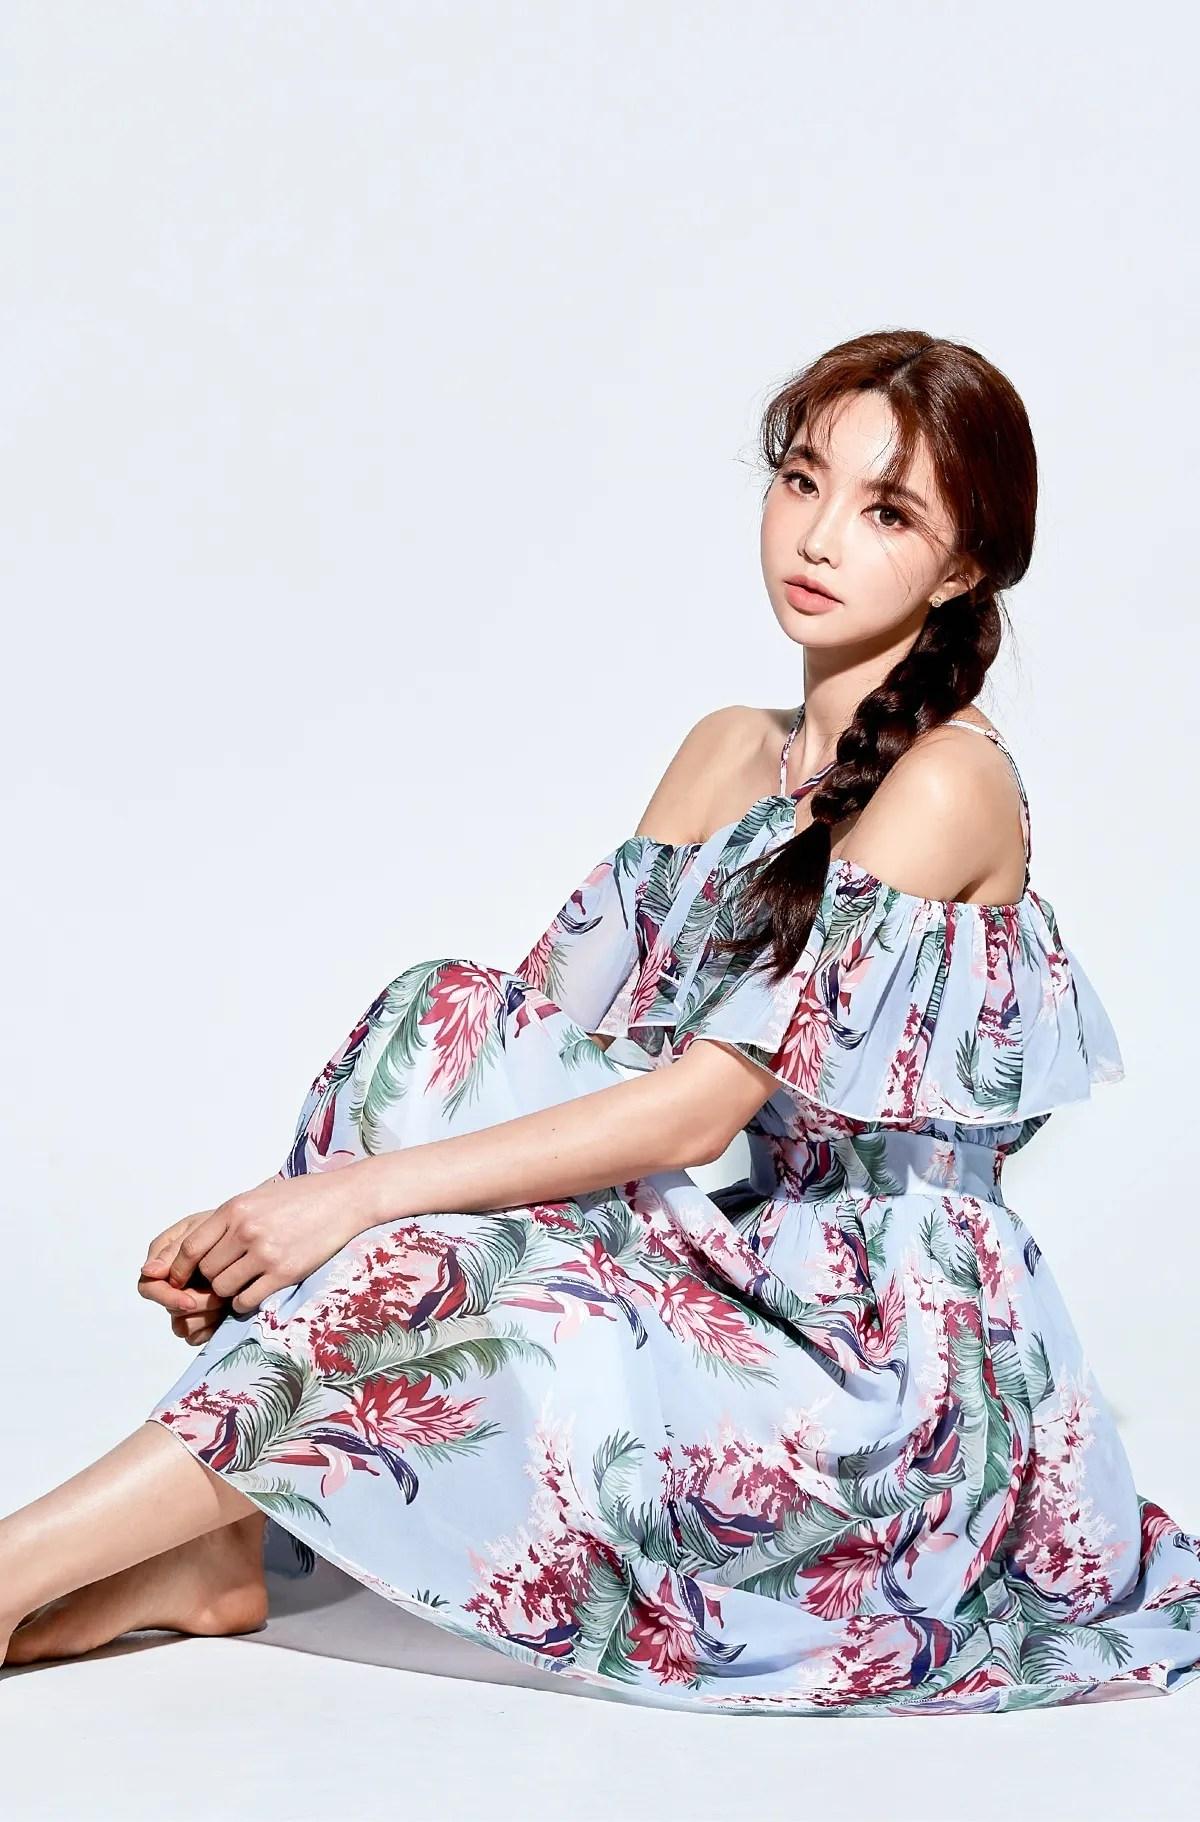 Park Suyeon / vendis / March 2021 / Casual Studioshoot